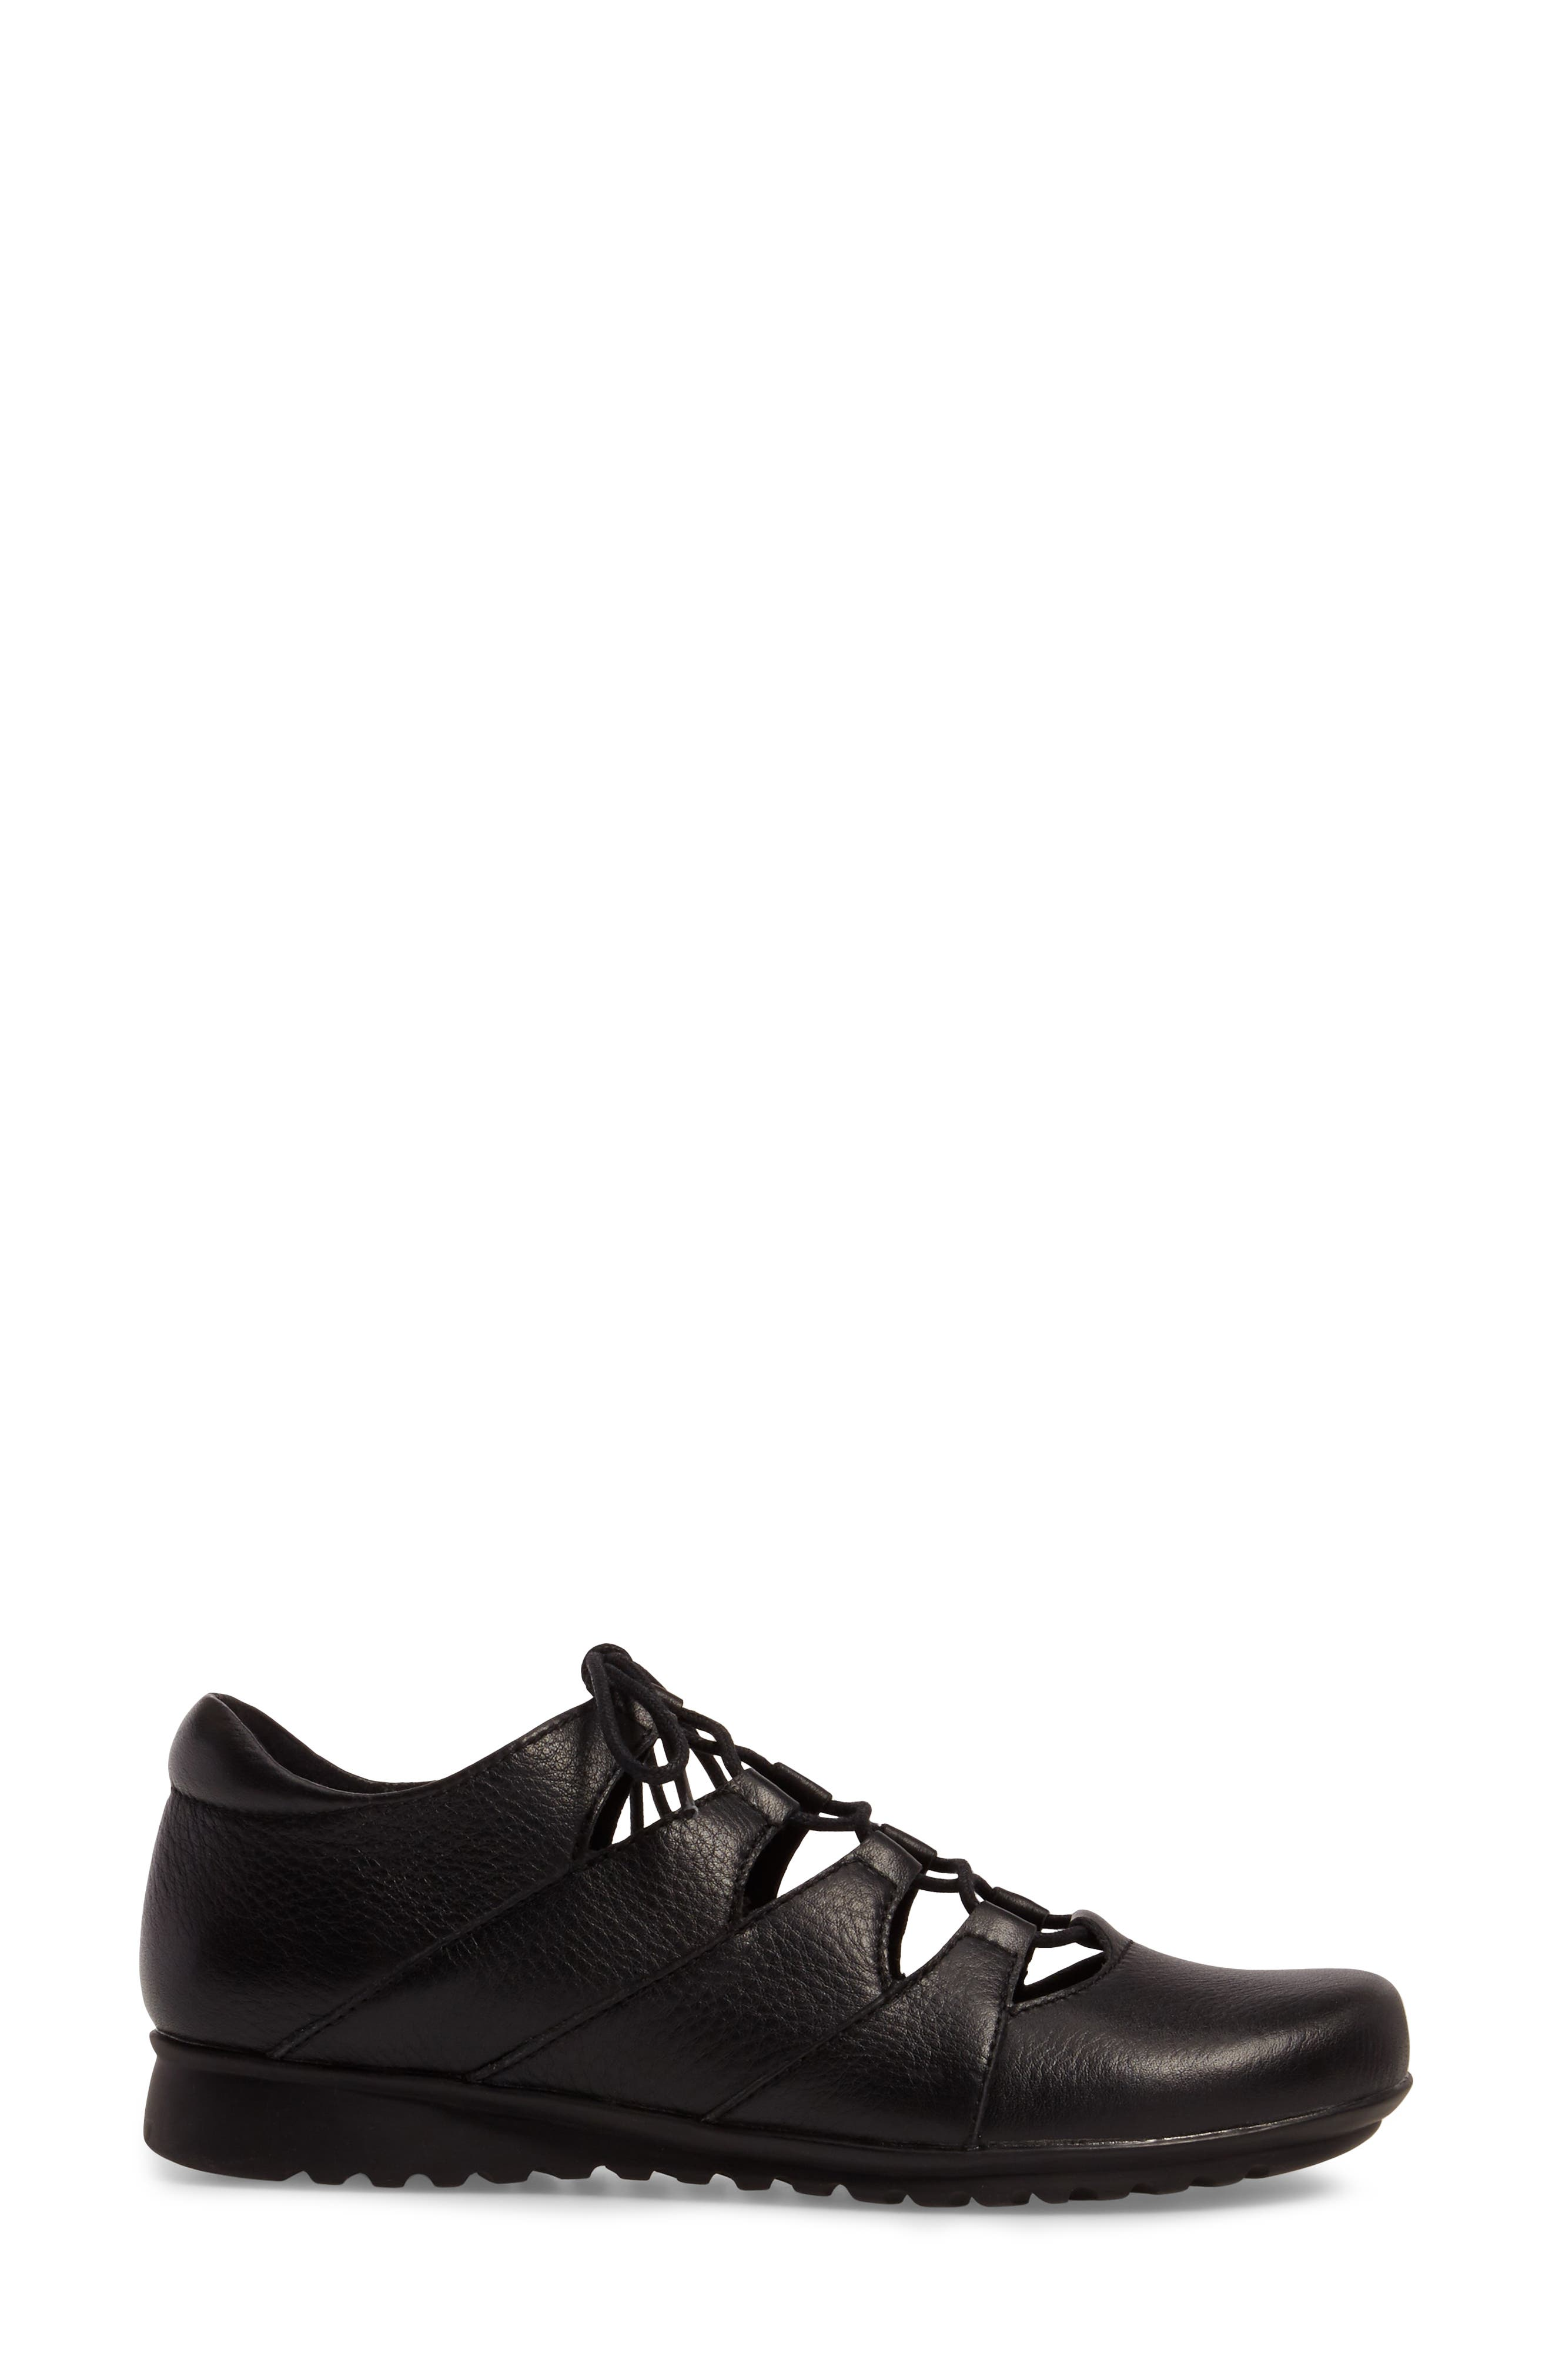 AETREX, Sienna Cutout Sneaker, Alternate thumbnail 3, color, BLACK LEATHER/ BLACK